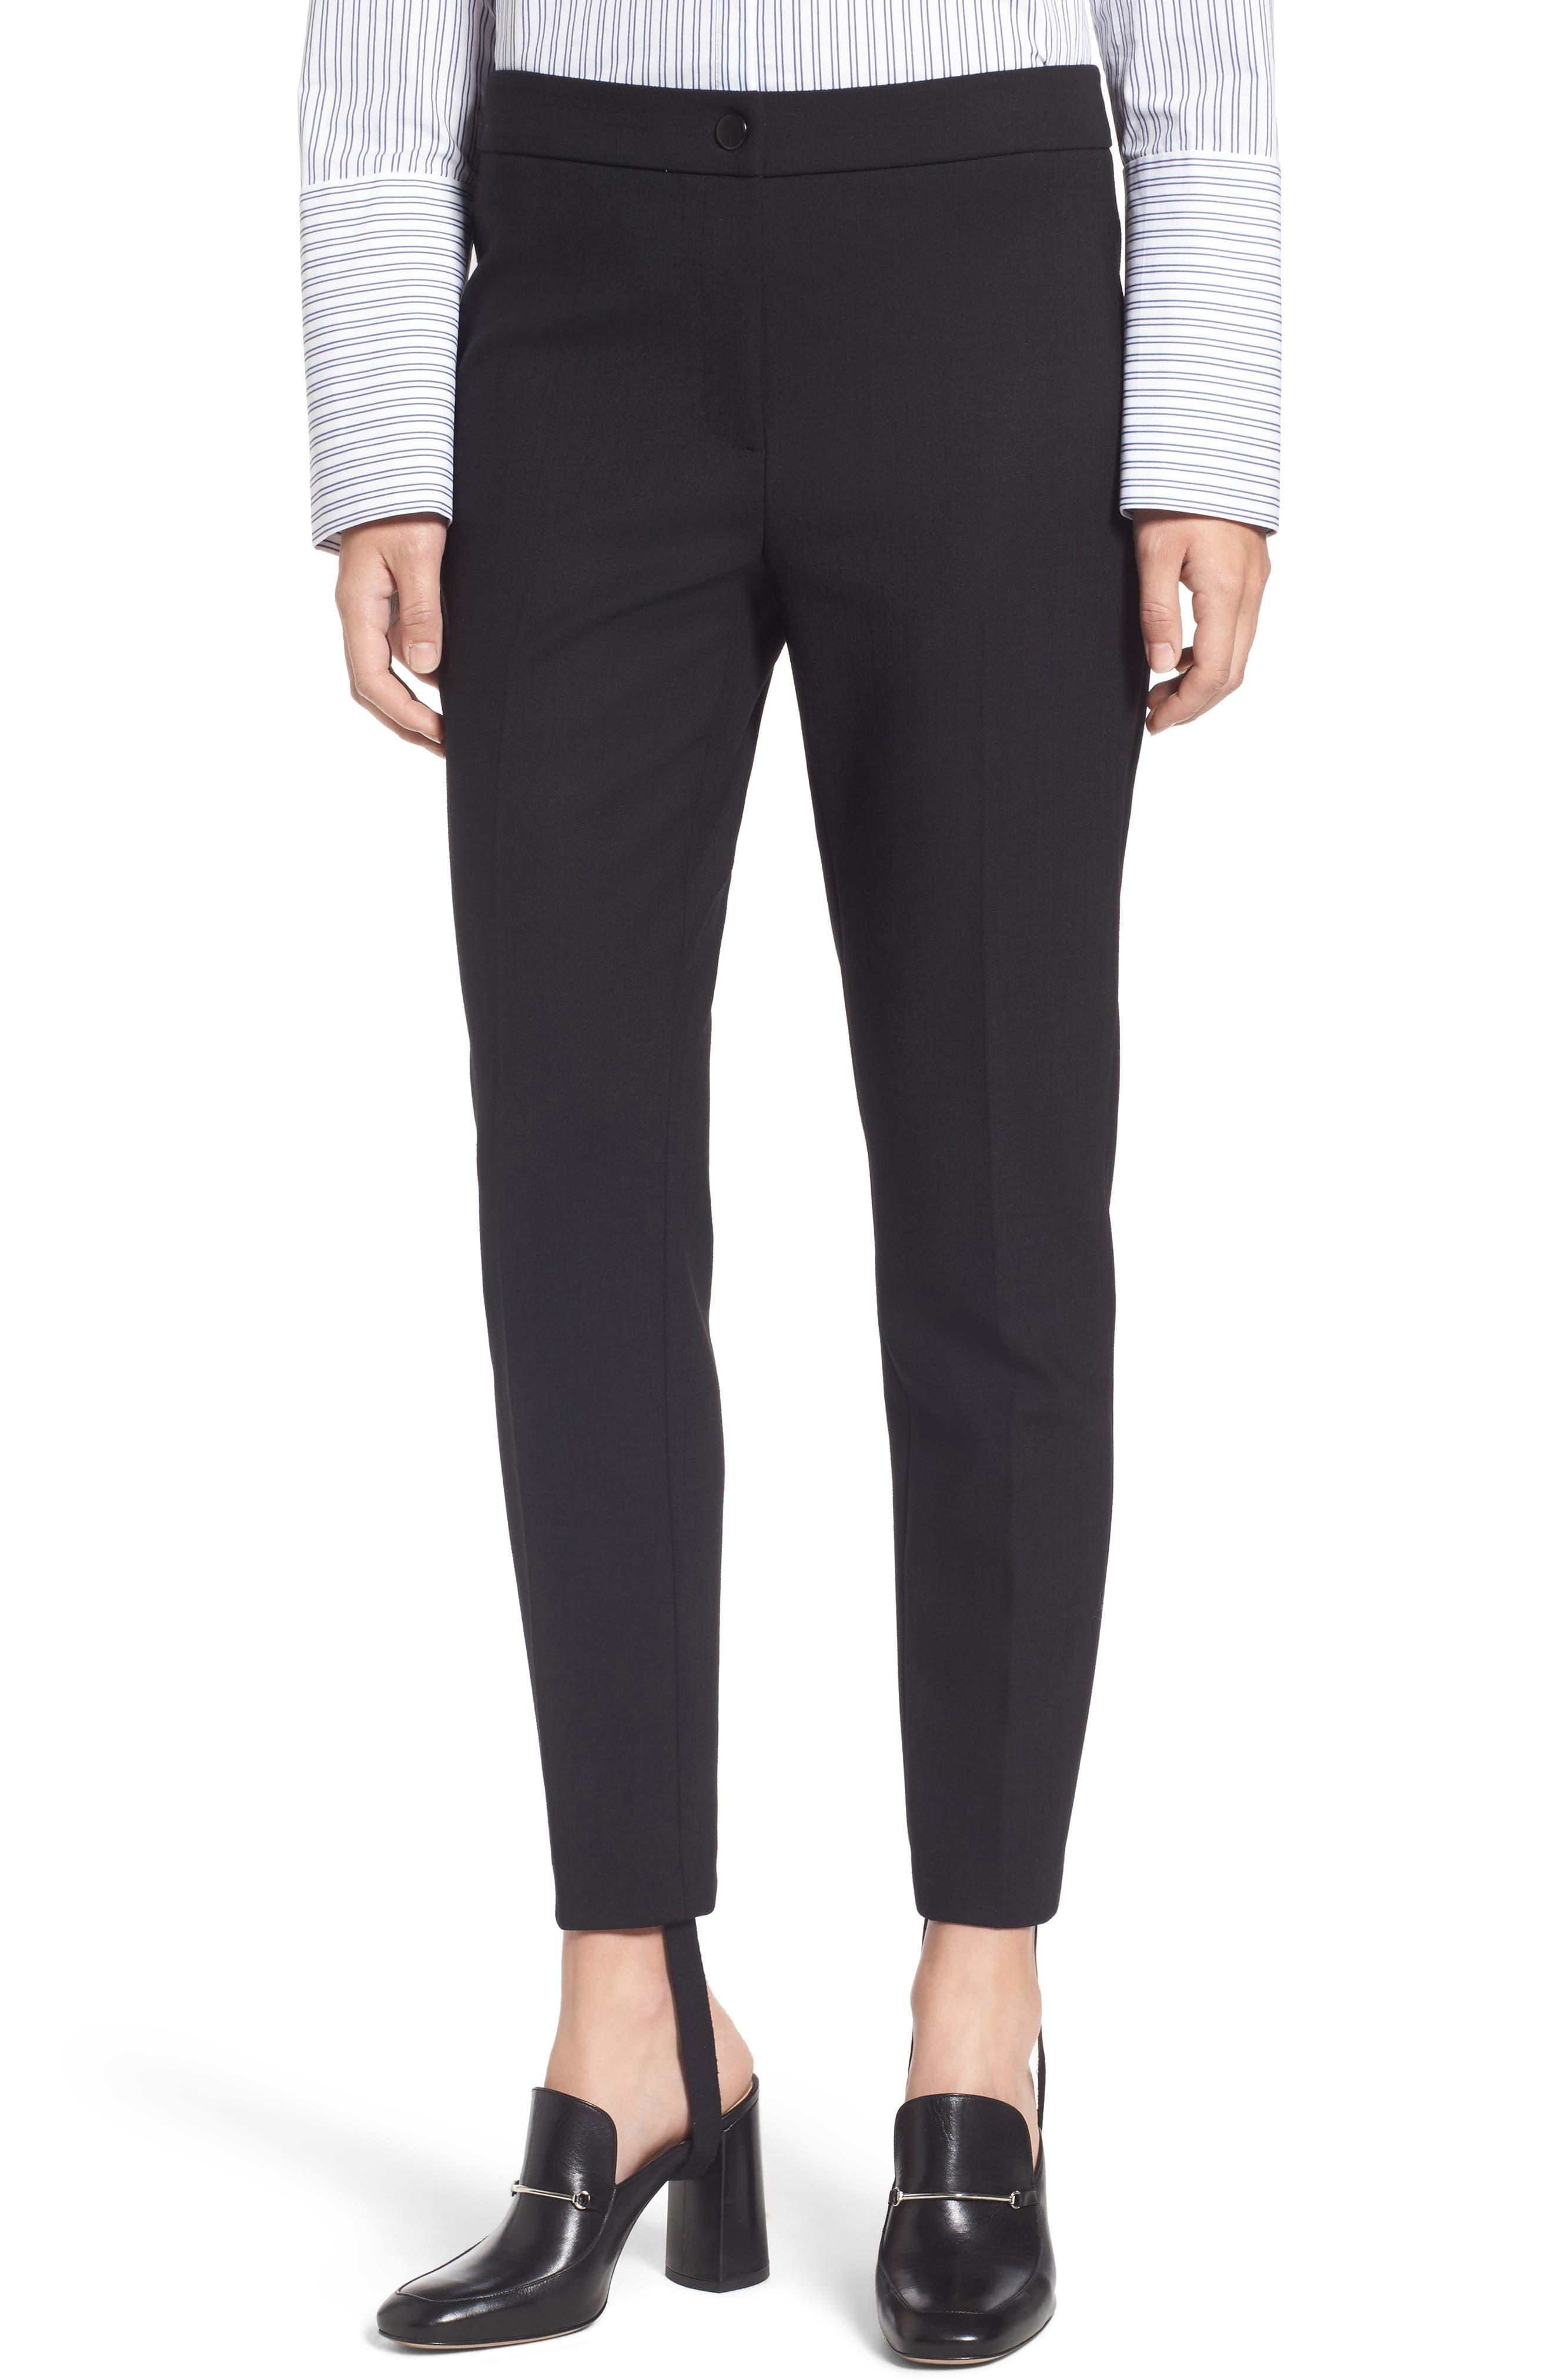 Removable Stirrup Pants,                             Main thumbnail 1, color,                             Black